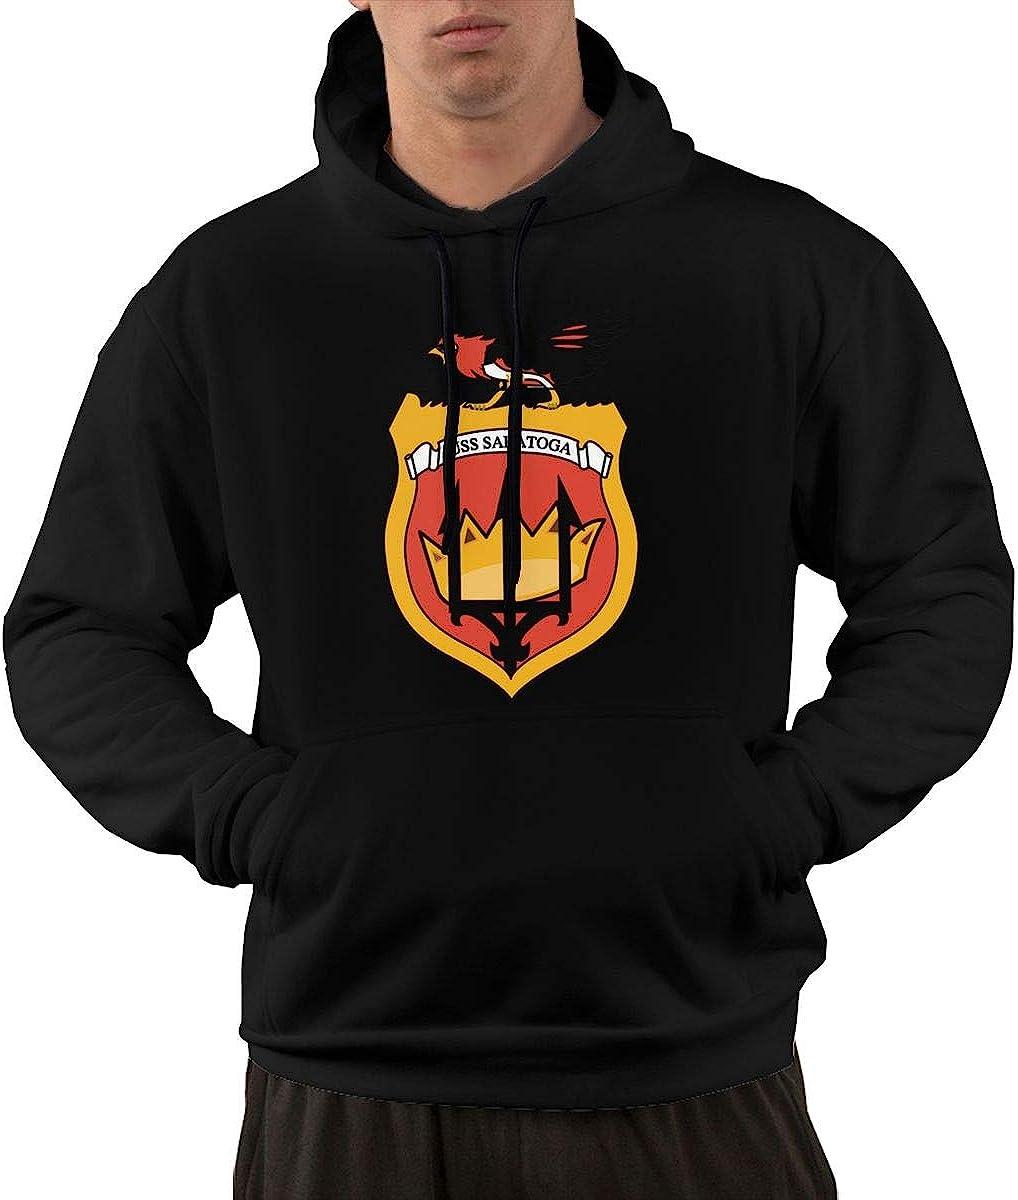 PinceponyHood Mens Navy USS Saratoga CVA-60 Hooded Fleece Sweatshirt